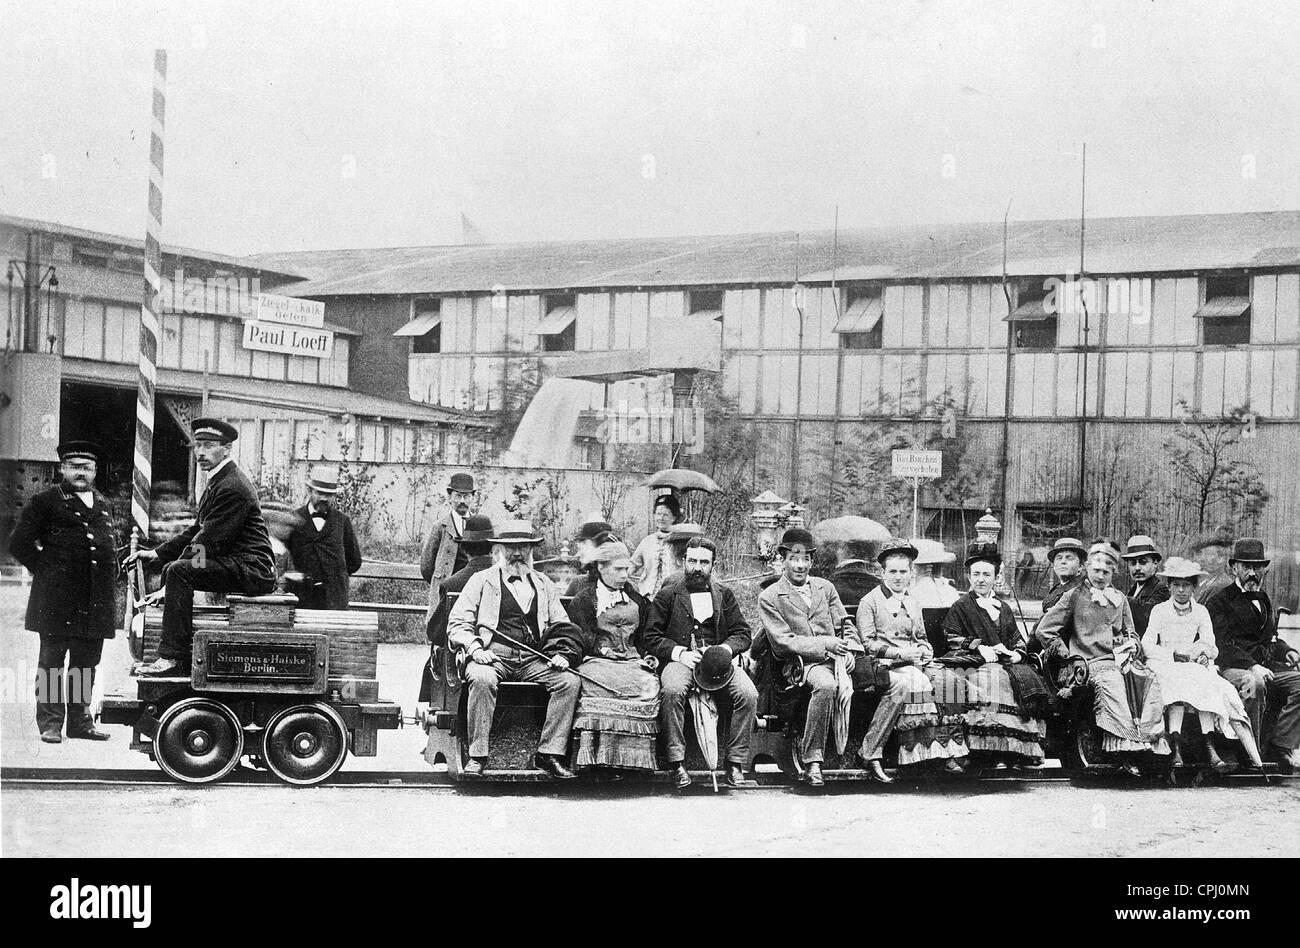 Electric locomotive, 1879 - Stock Image